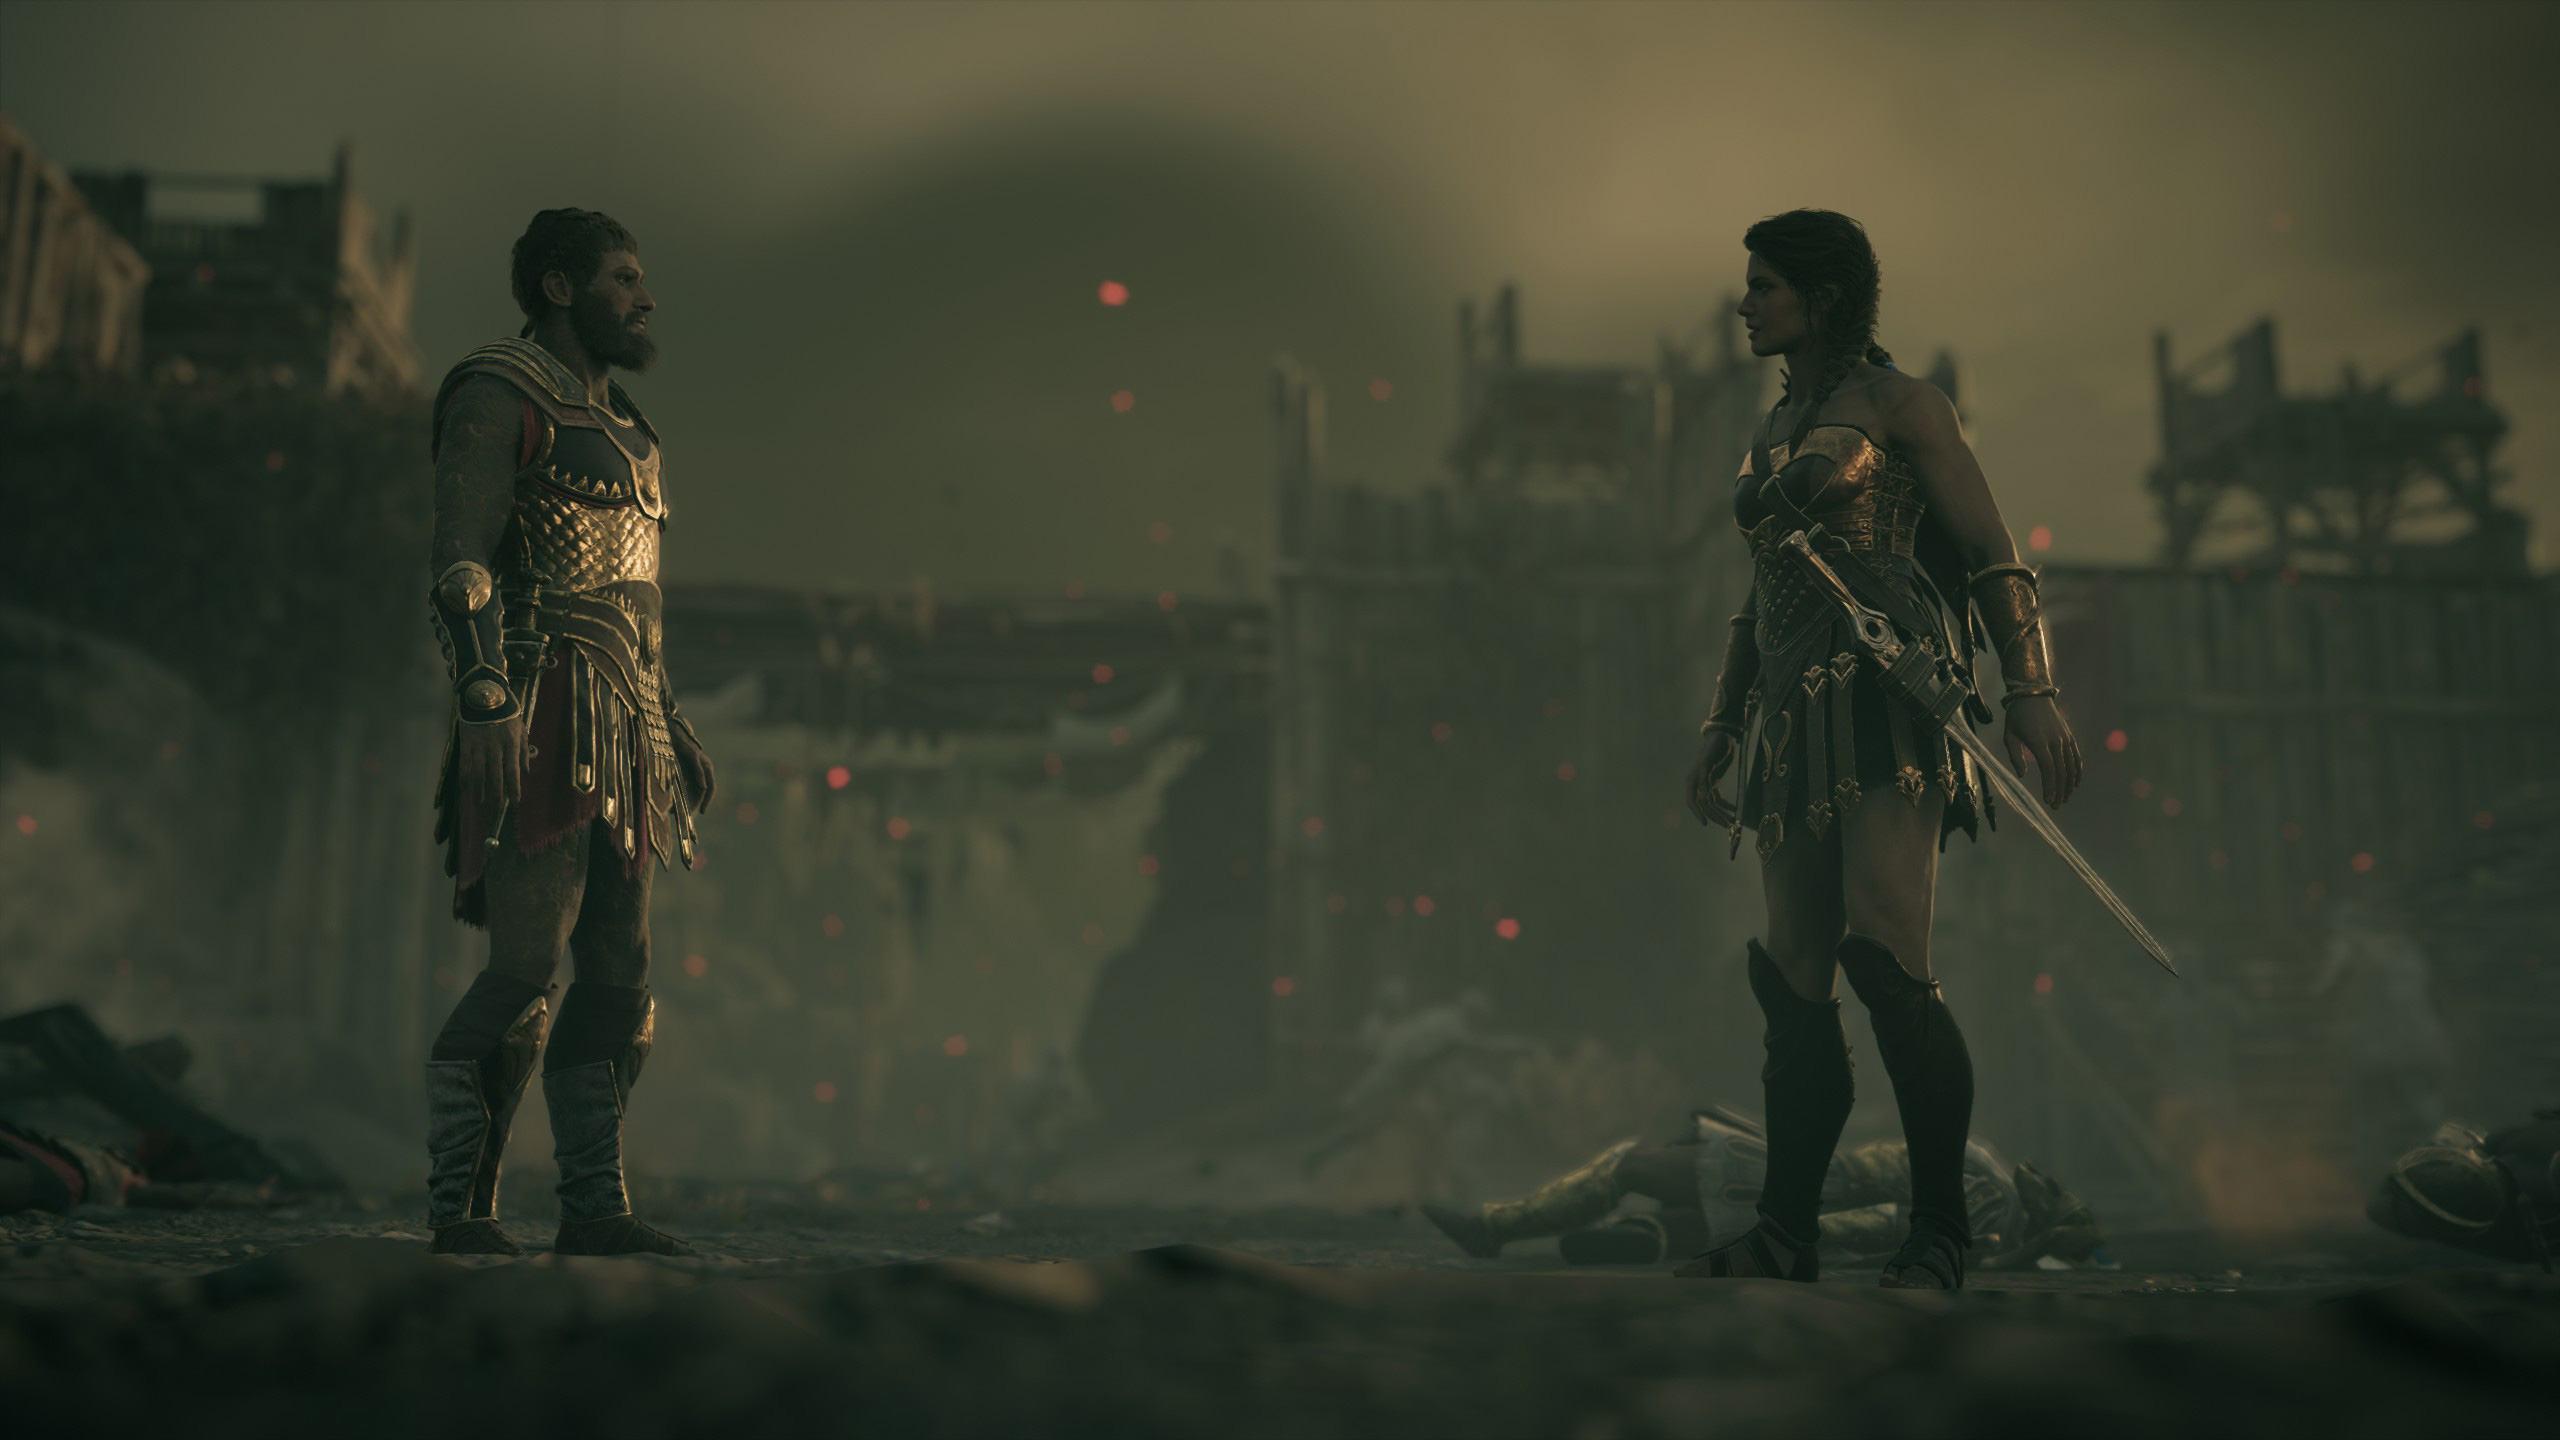 Assassin's-Creed®-Odyssey2020-3-26-2-40-35.jpg